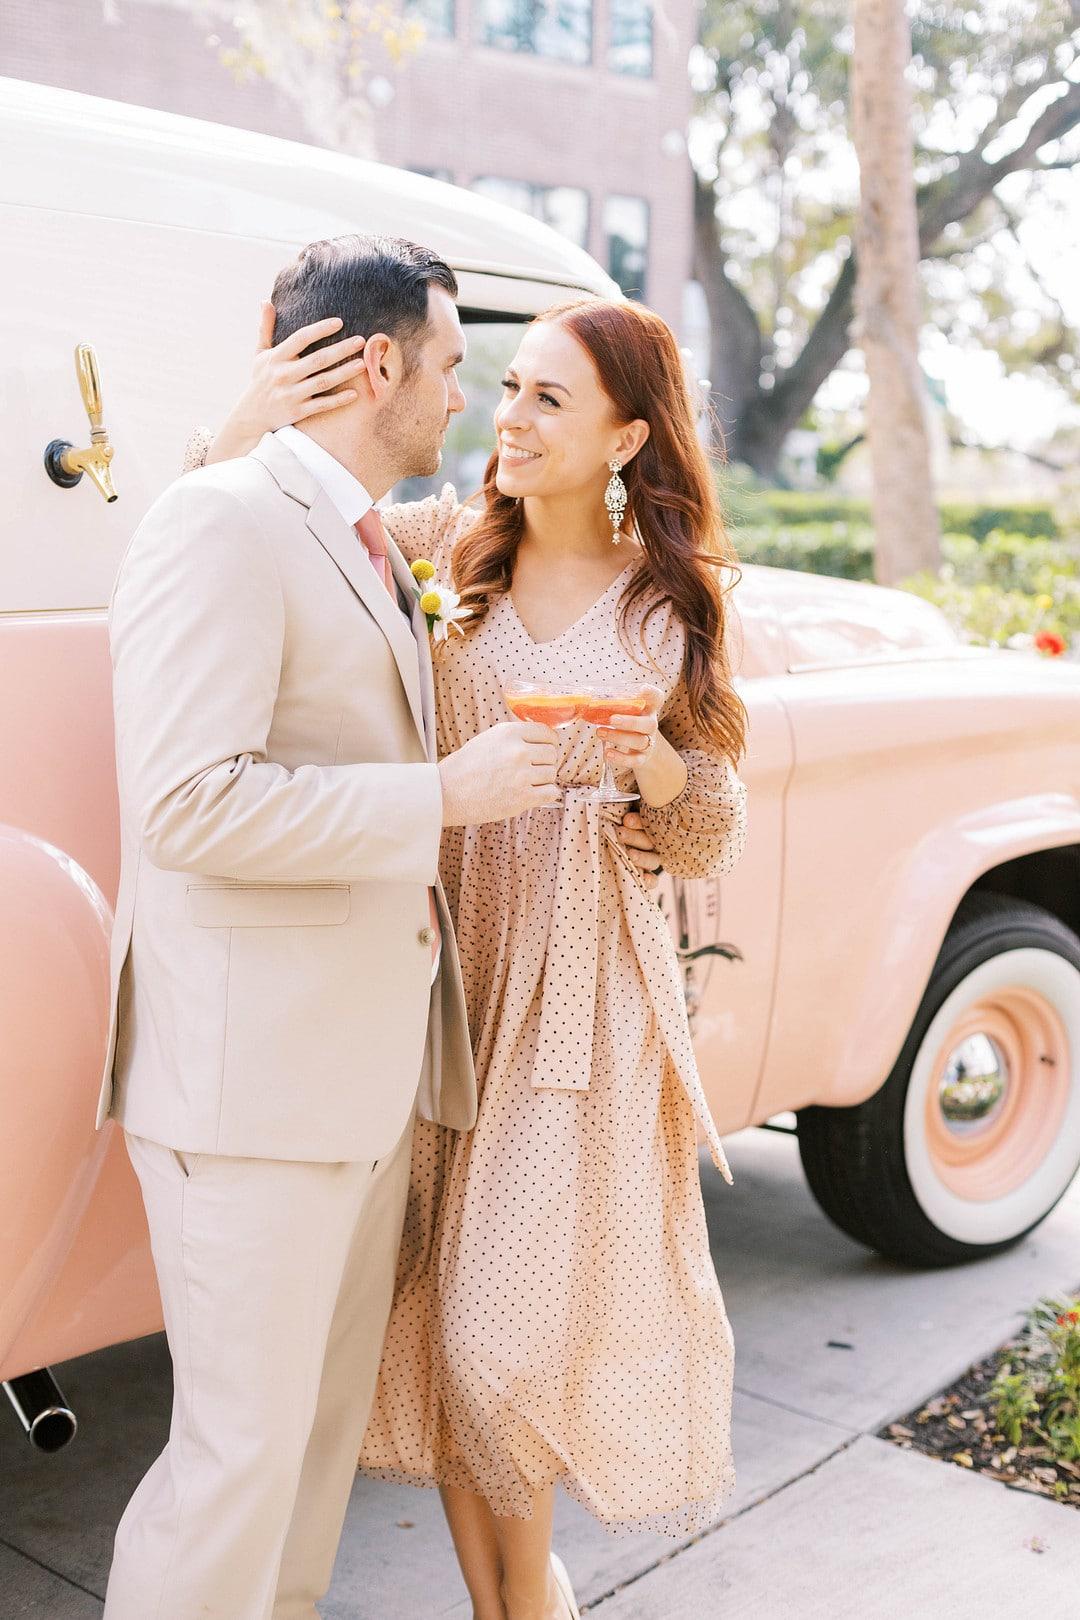 70's Inspired Wedding - Styled Shoot 77